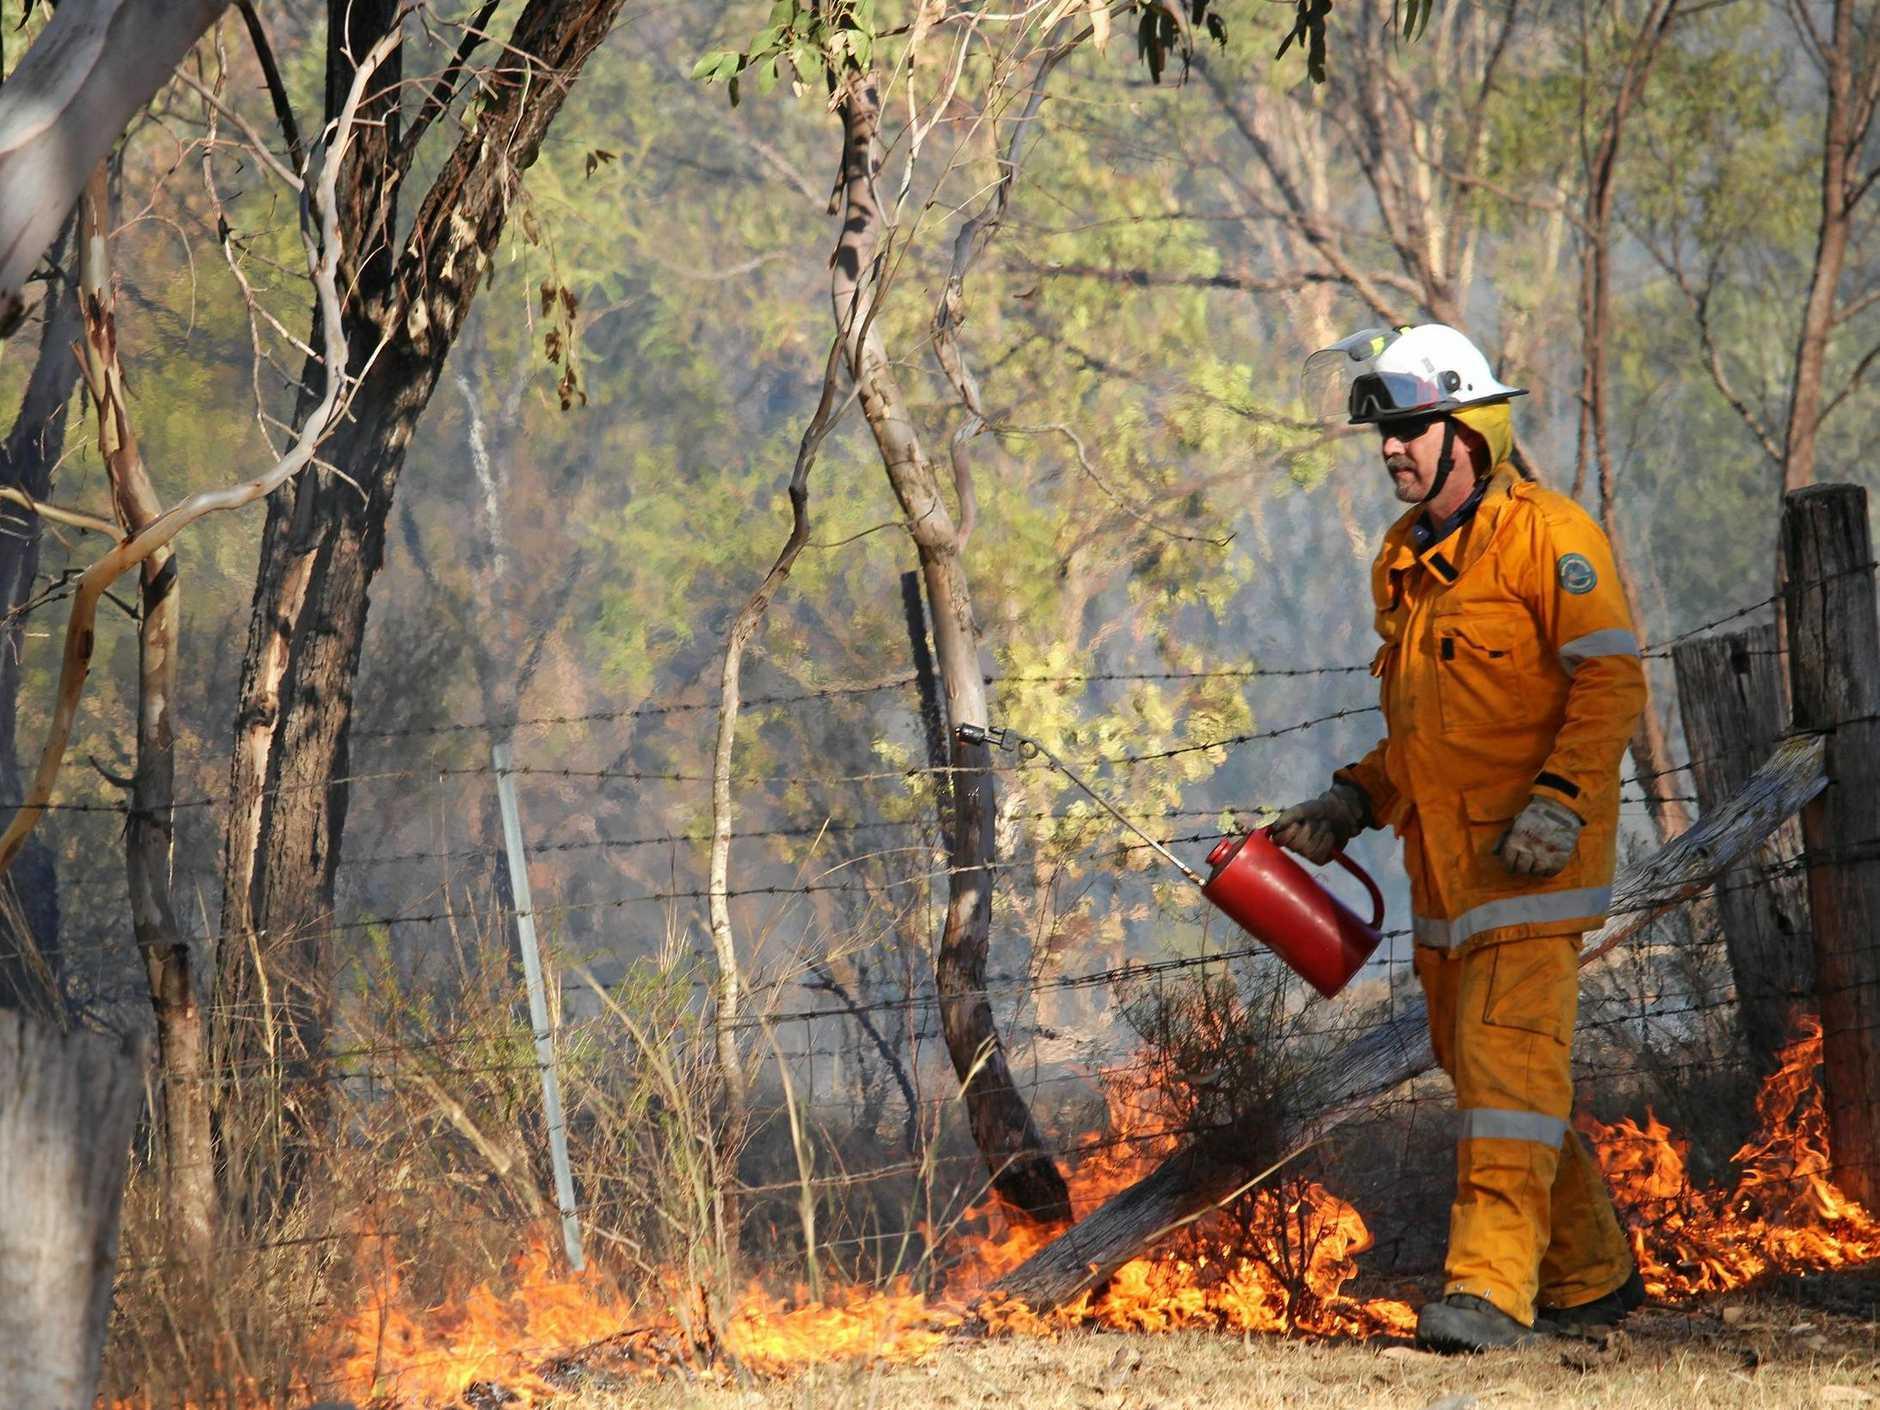 ON THE JOB: Hugh Strong performs back-burns in Girraween National Park near Wallangarra.